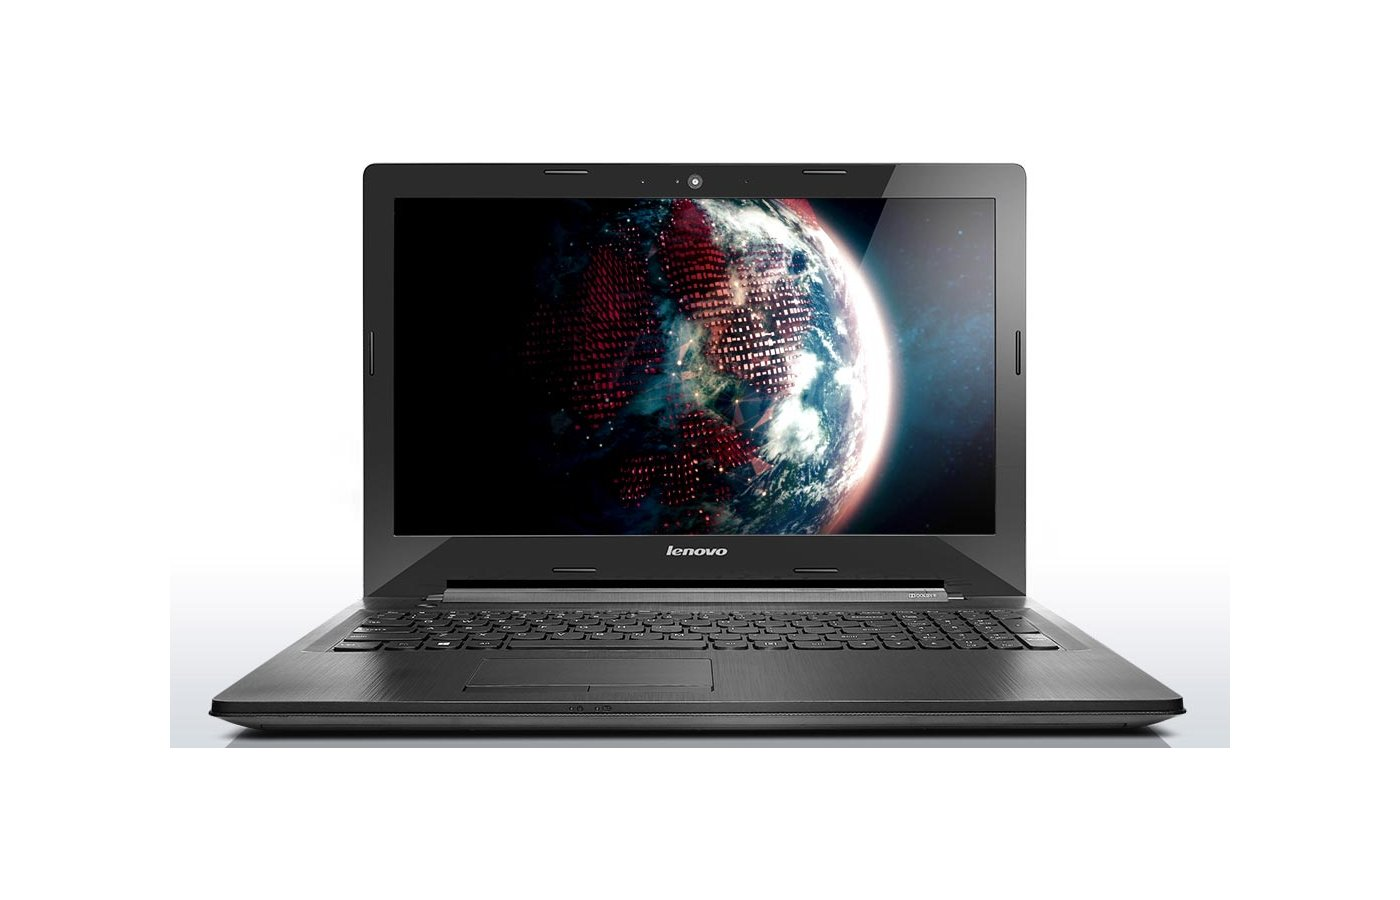 Ноутбук Lenovo IdeaPad 300-15ISK /80Q70019RK/